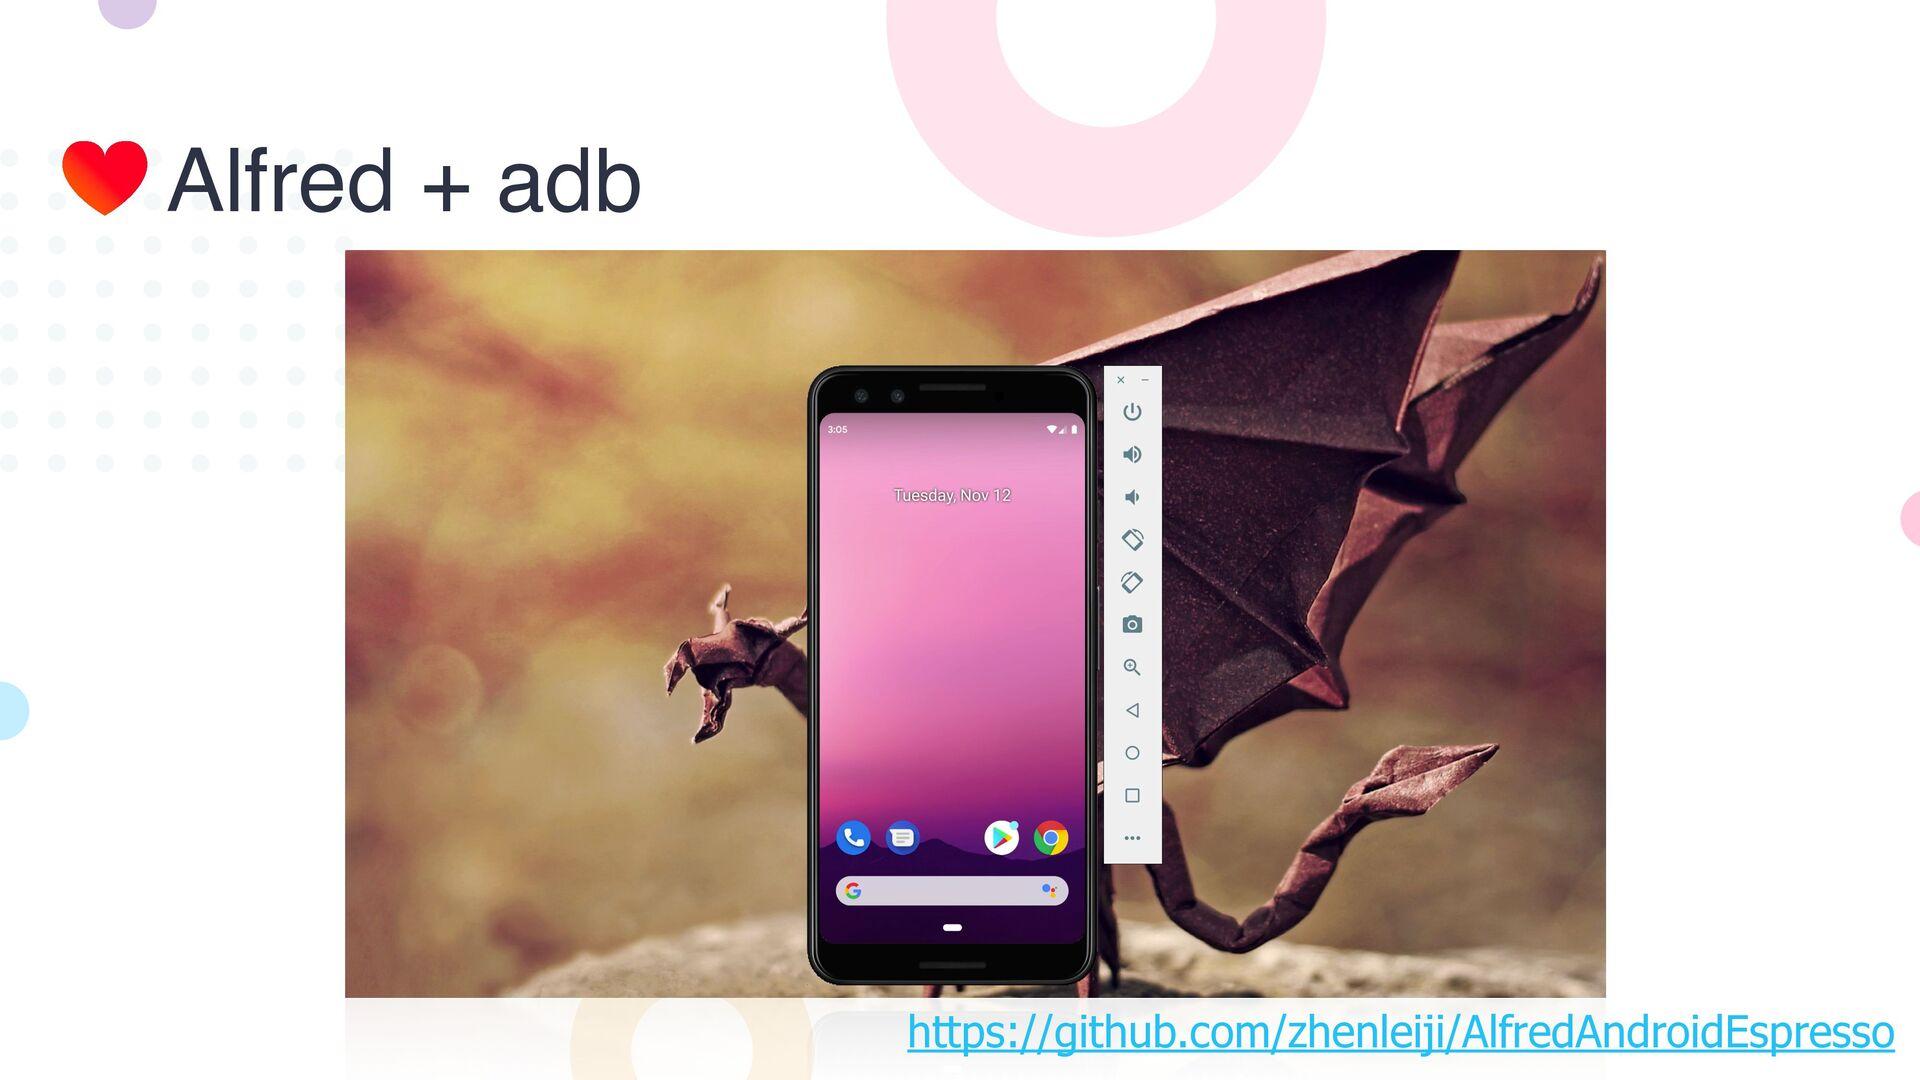 Create scripts https://github.com/zhenleiji/And...